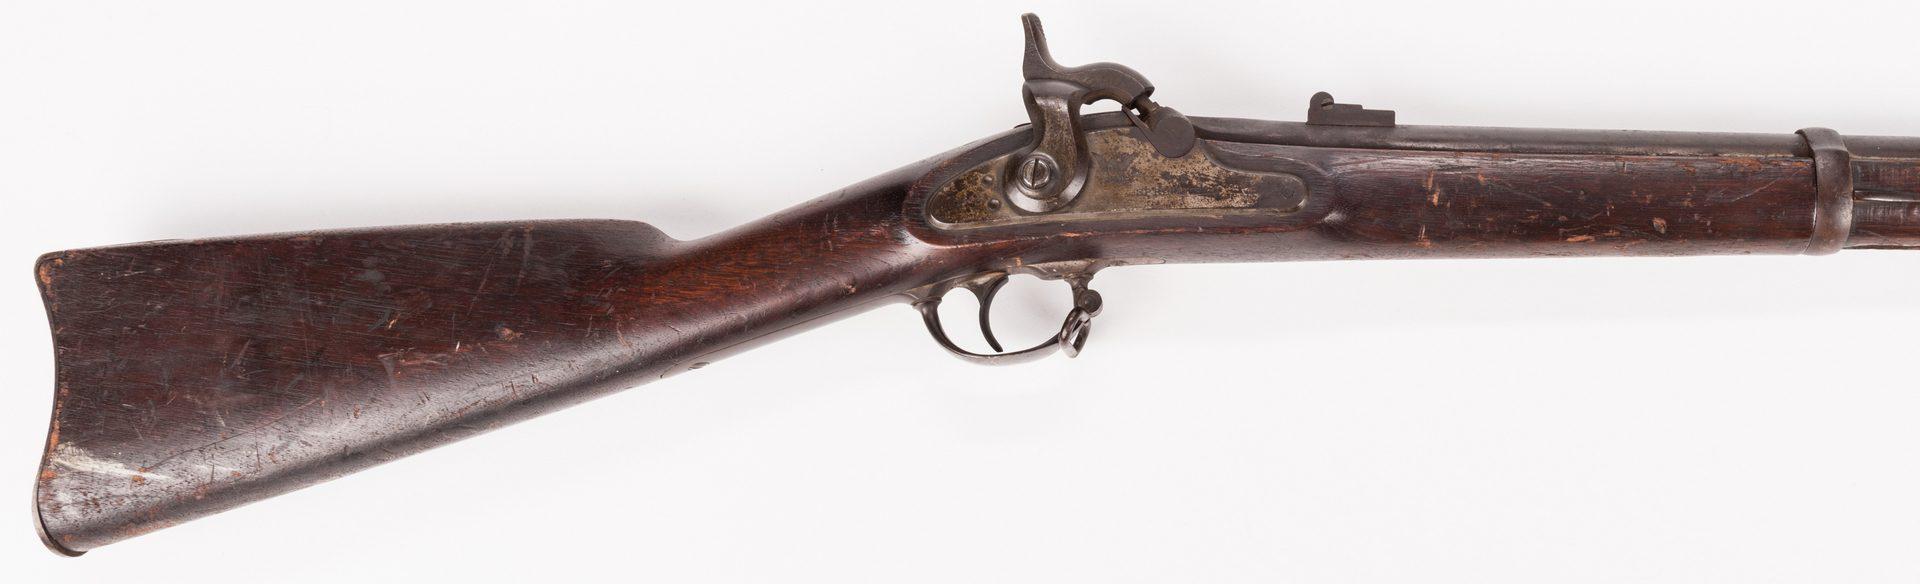 Lot 217: 2 Civil War Rifles, Springfield & Perry